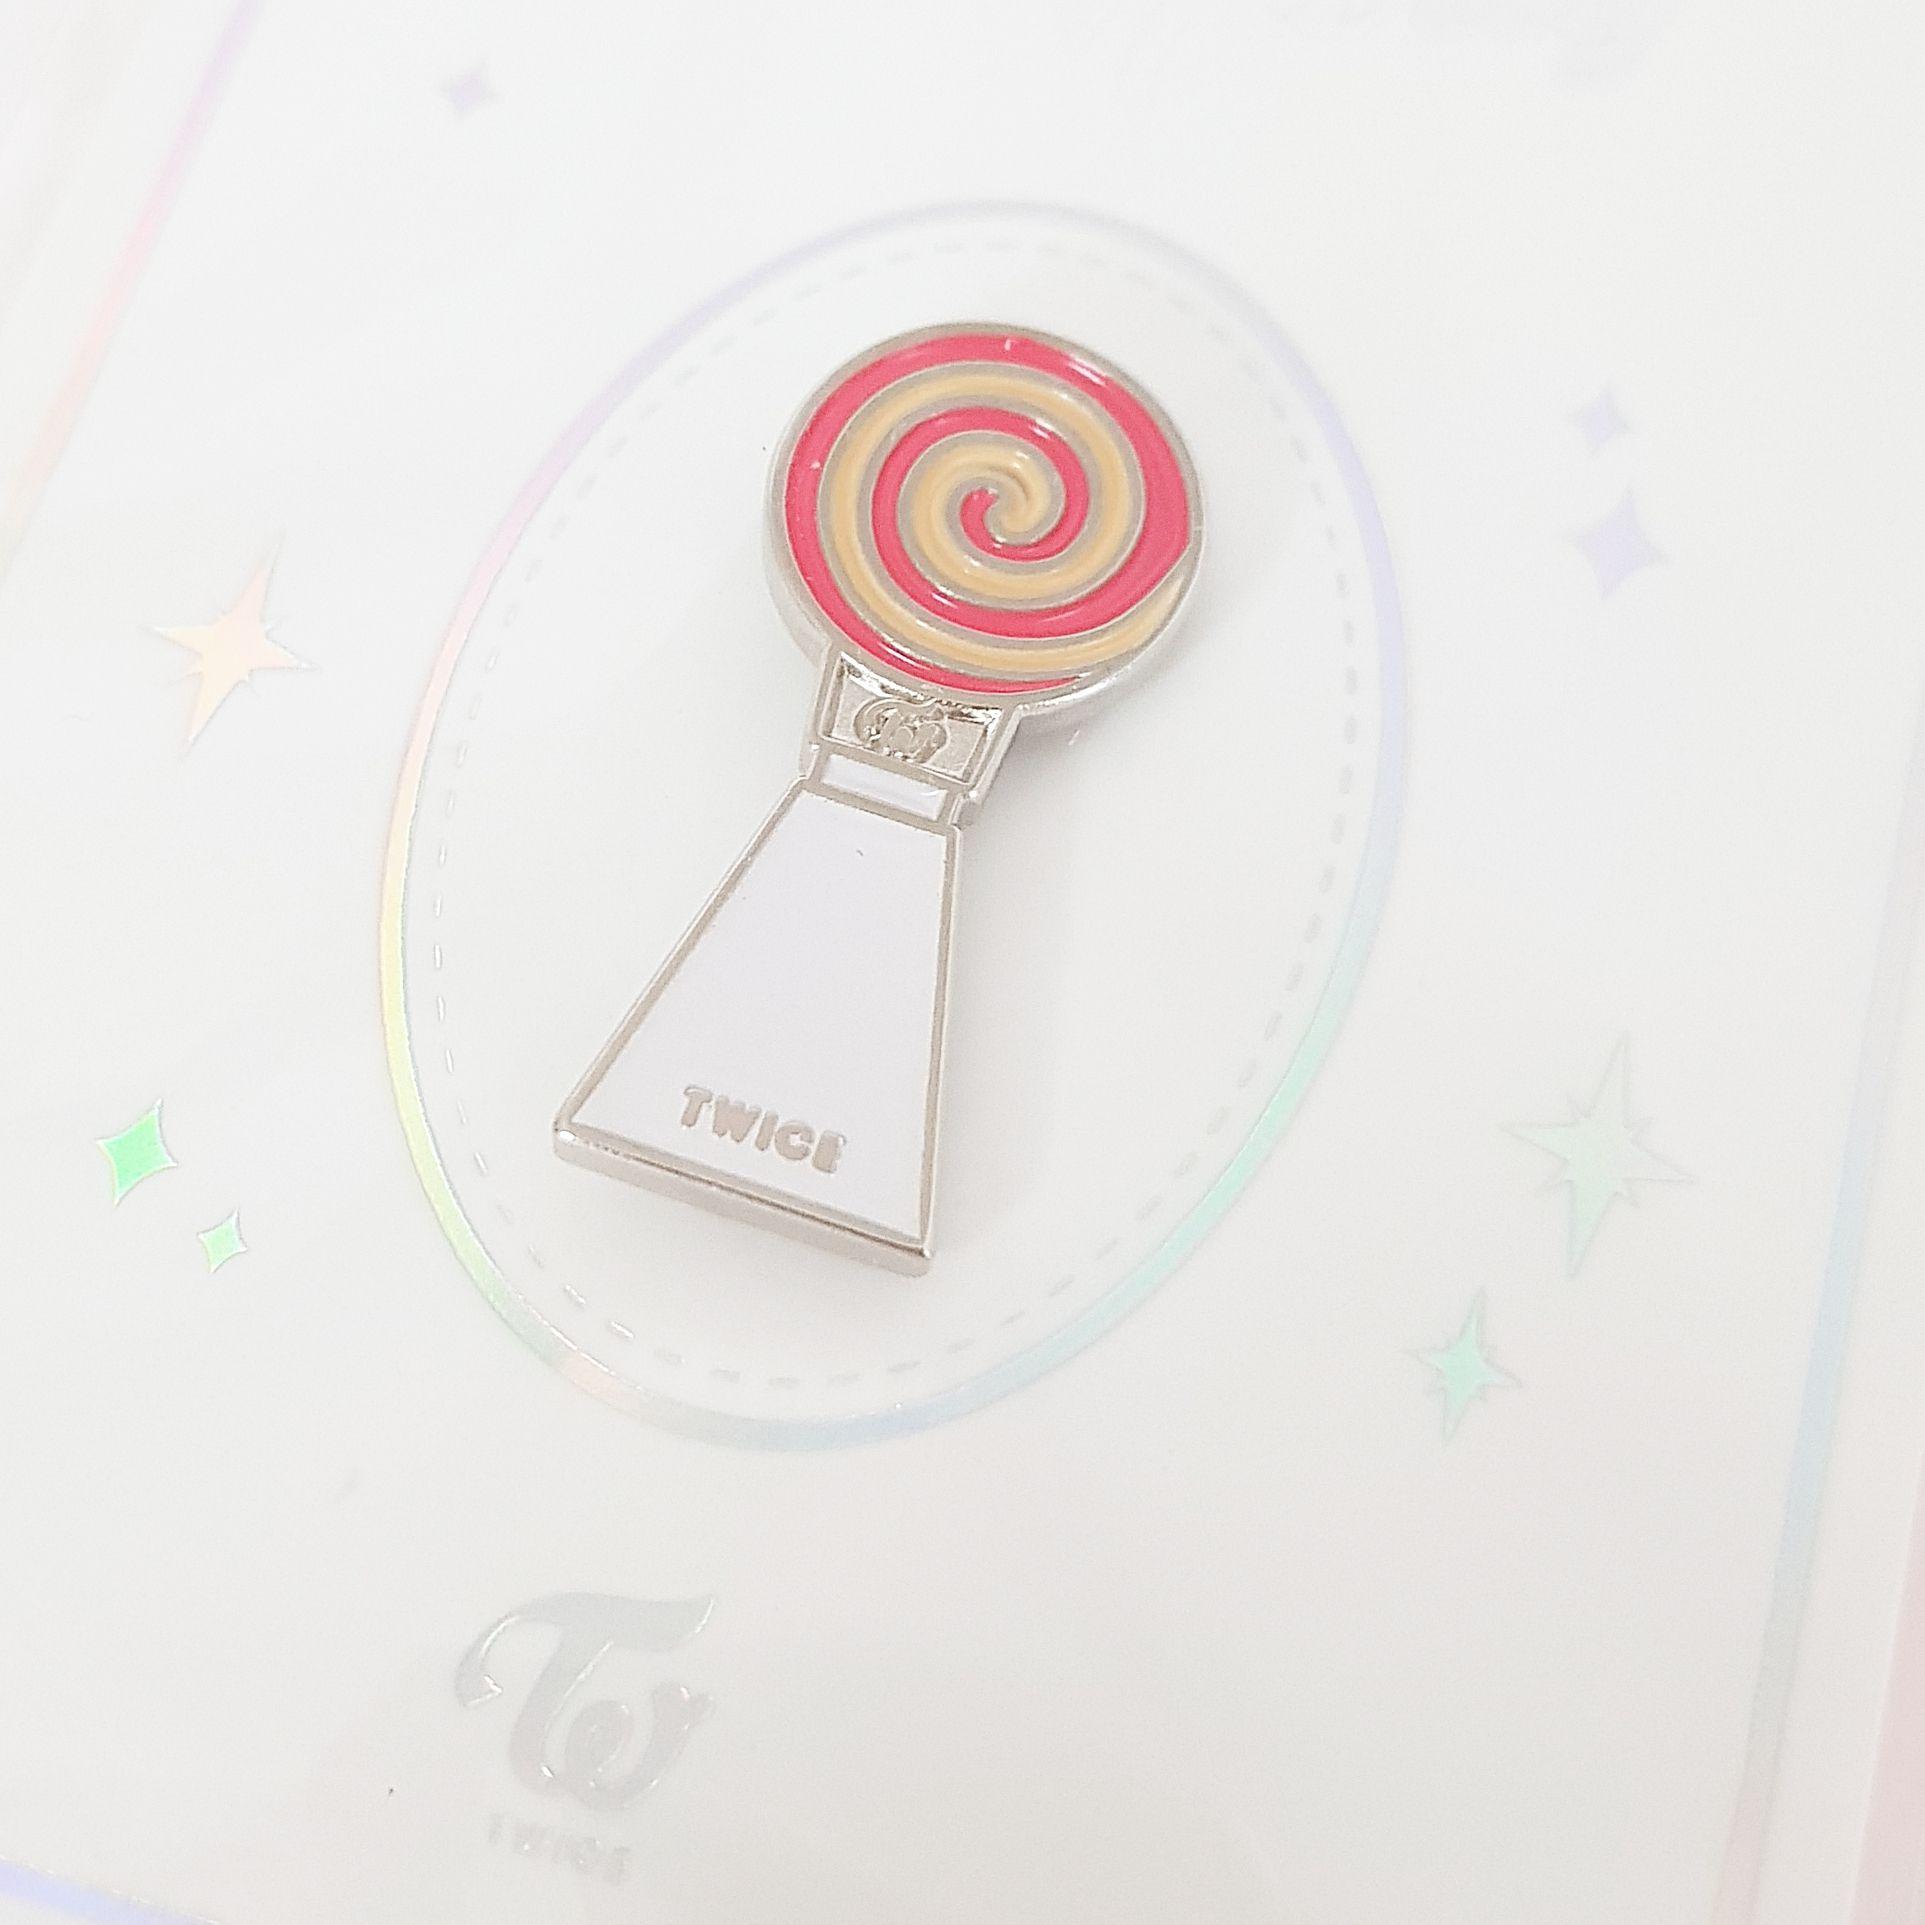 TWICE Official Merchandise CandyBong METAL BADGE | TWICE in